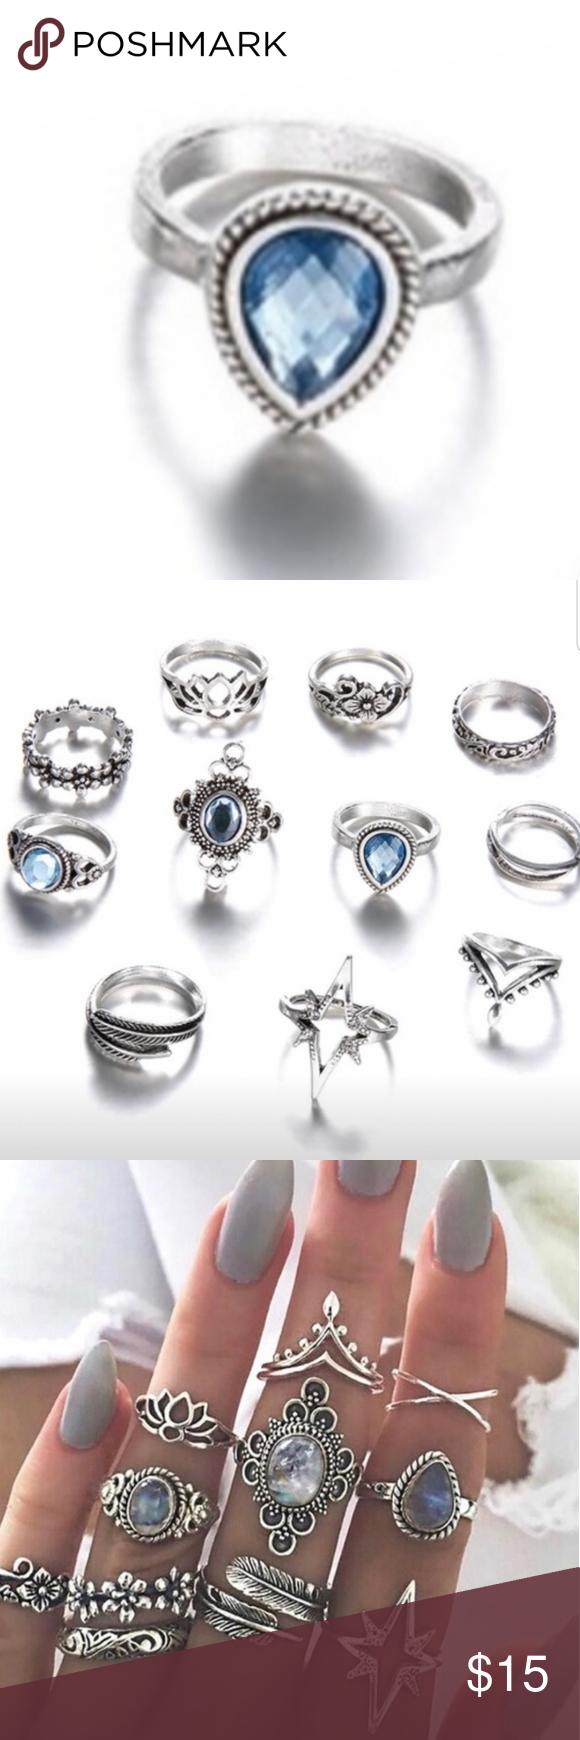 Pandora Jewelry 60% OFF!> Silver Opal Bohemian Ring Brand new Jewelry Rings #Jewelry #PANDORA #style #Accessories #shopping #styles #outfit #pretty #girl #girls #beauty #beautiful #me #cute #stylish #design #fashion #outfits #PANDORAbracelets #PANDORAcharm